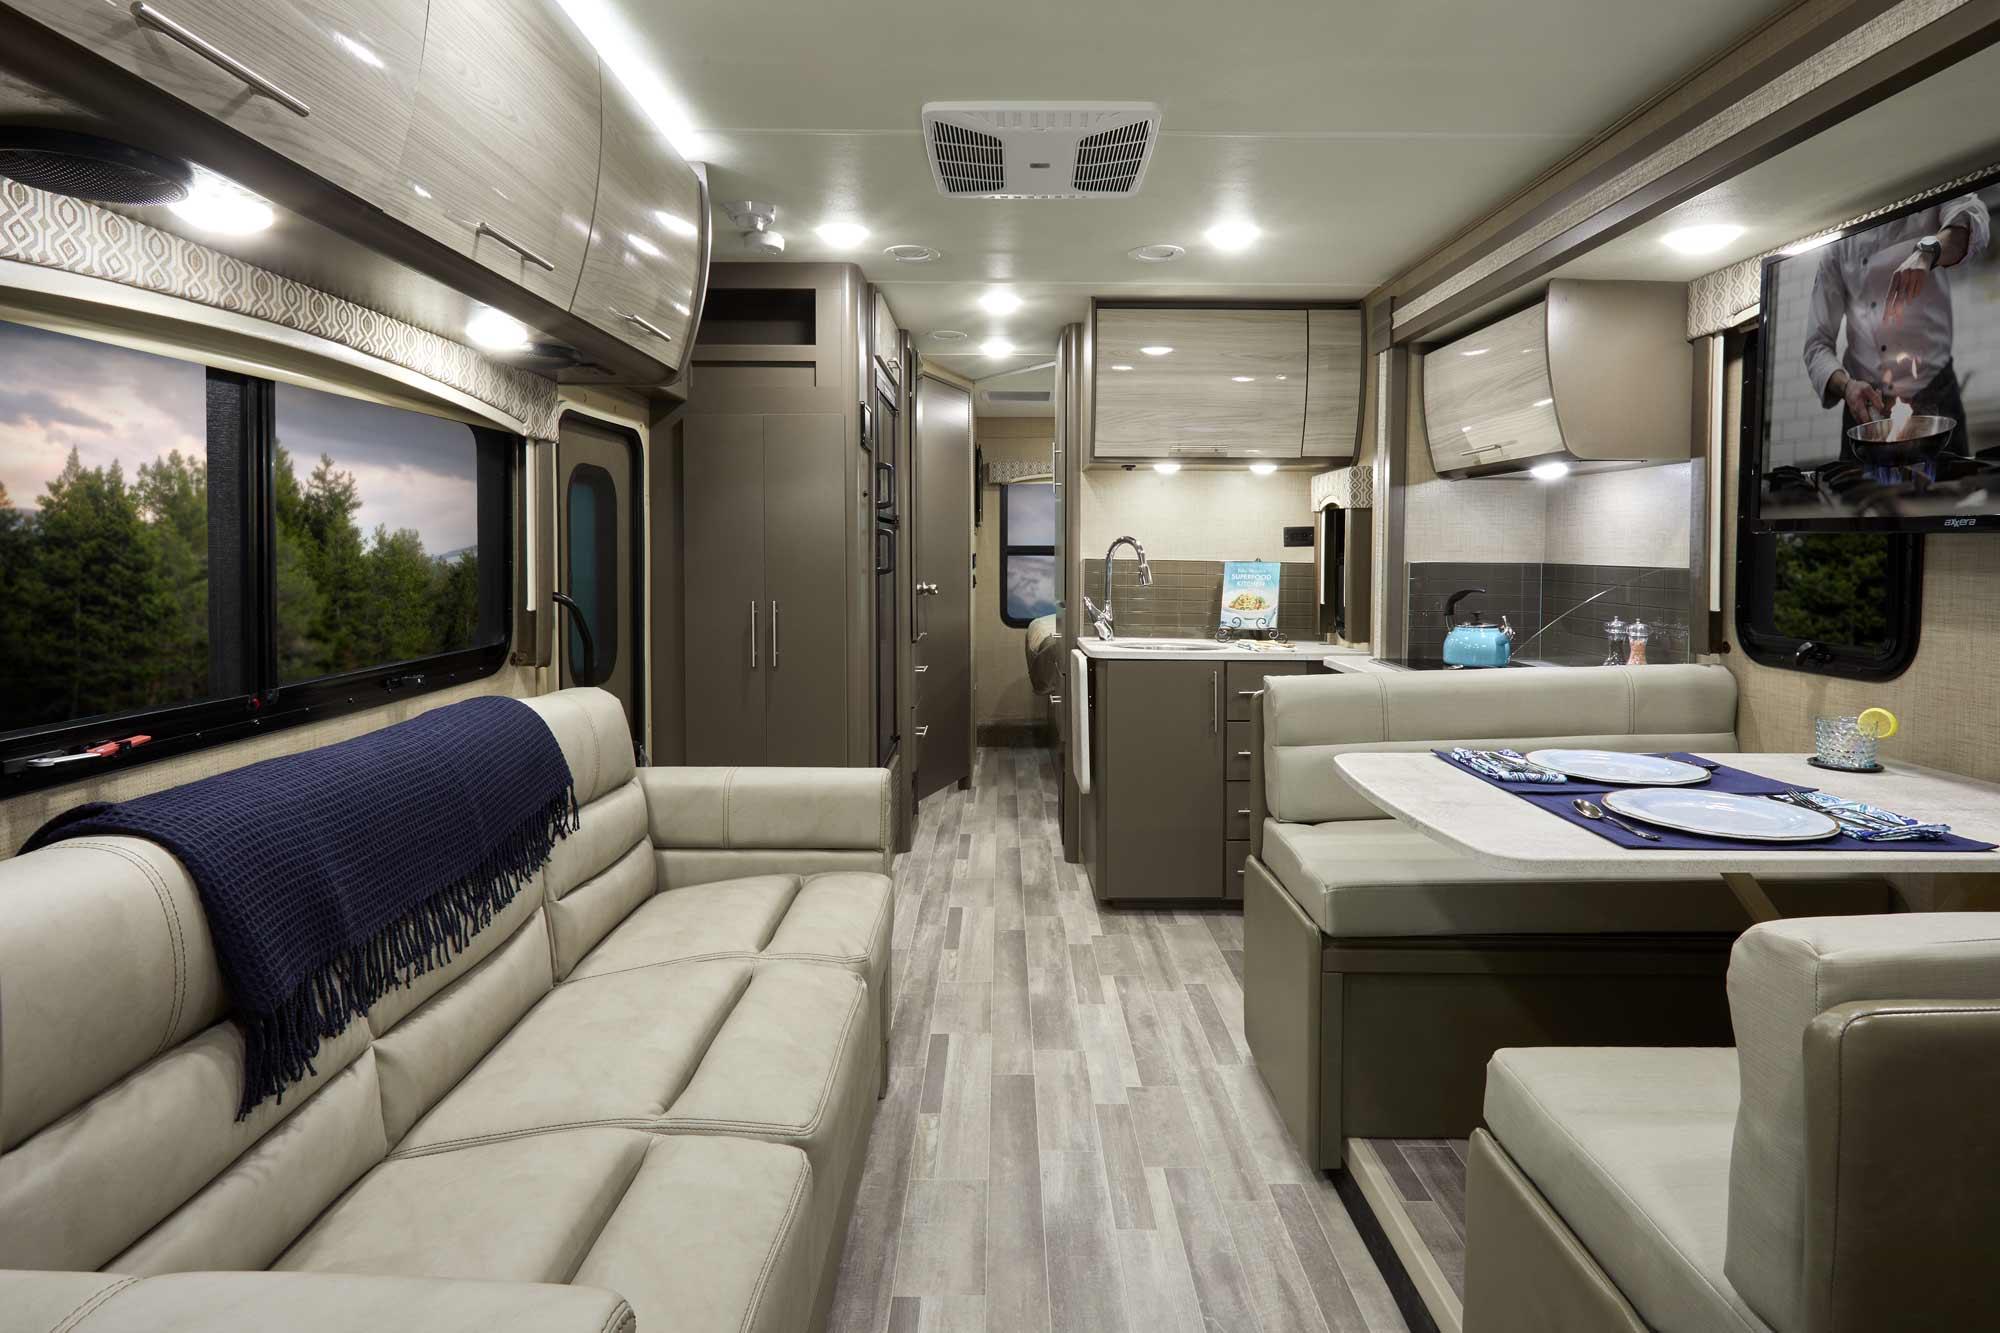 Vegas Ruv Class A Motorhomes Thor Motor Coach 2015 Wiring Diagram 2019 277 Diamondback Ii Silver Oak Front To Back